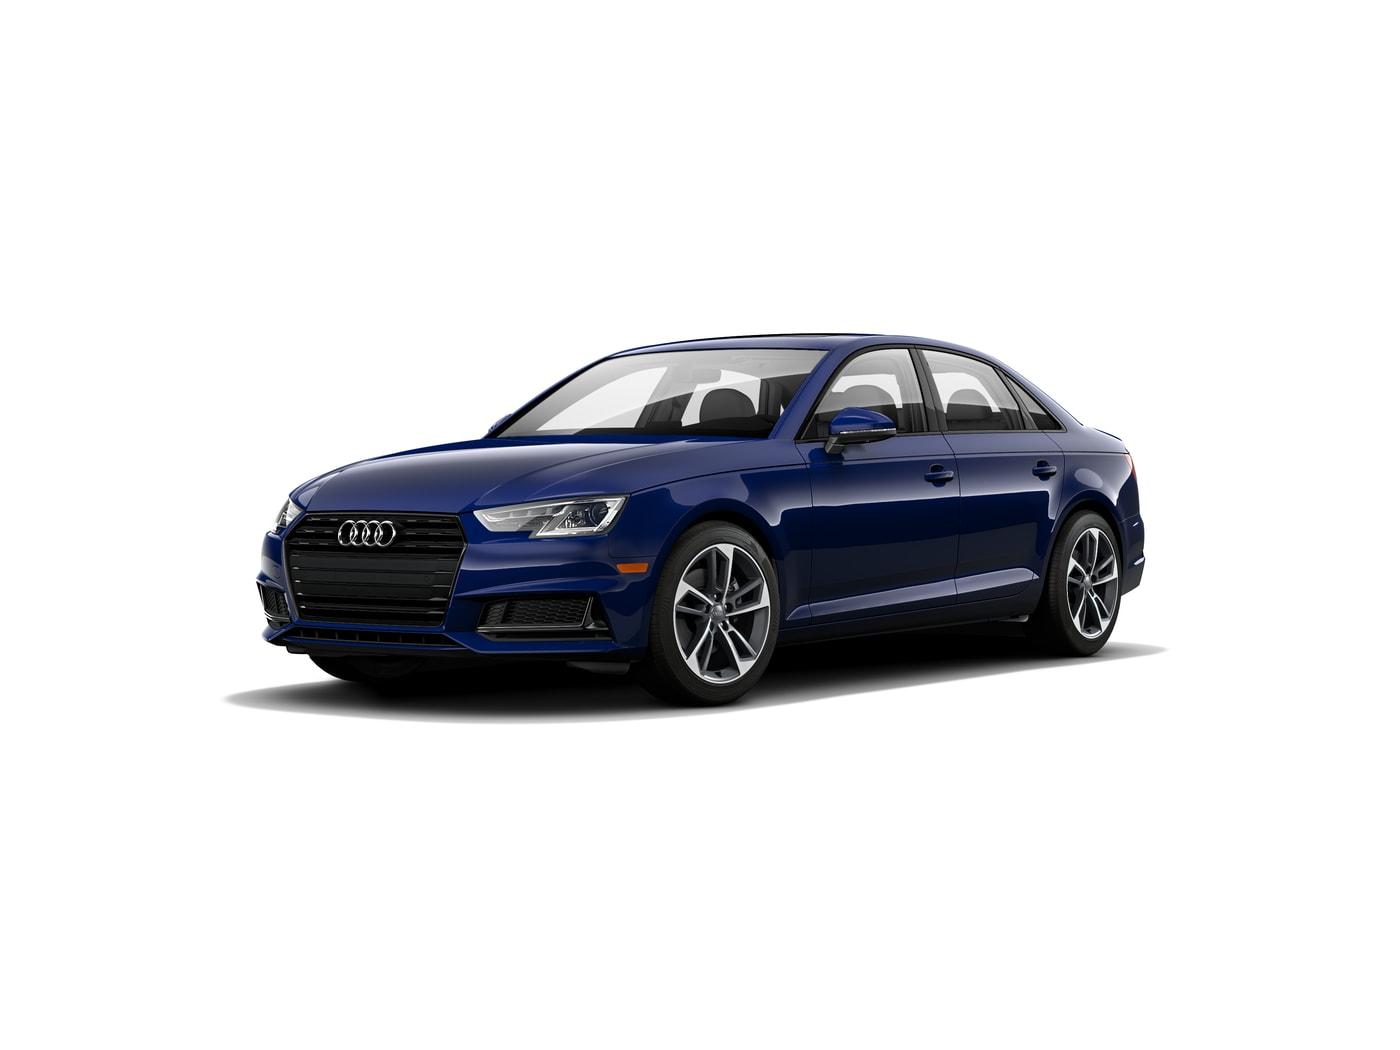 2019 Audi A4 A4 TITANIUM 2.0T FWD Sedan